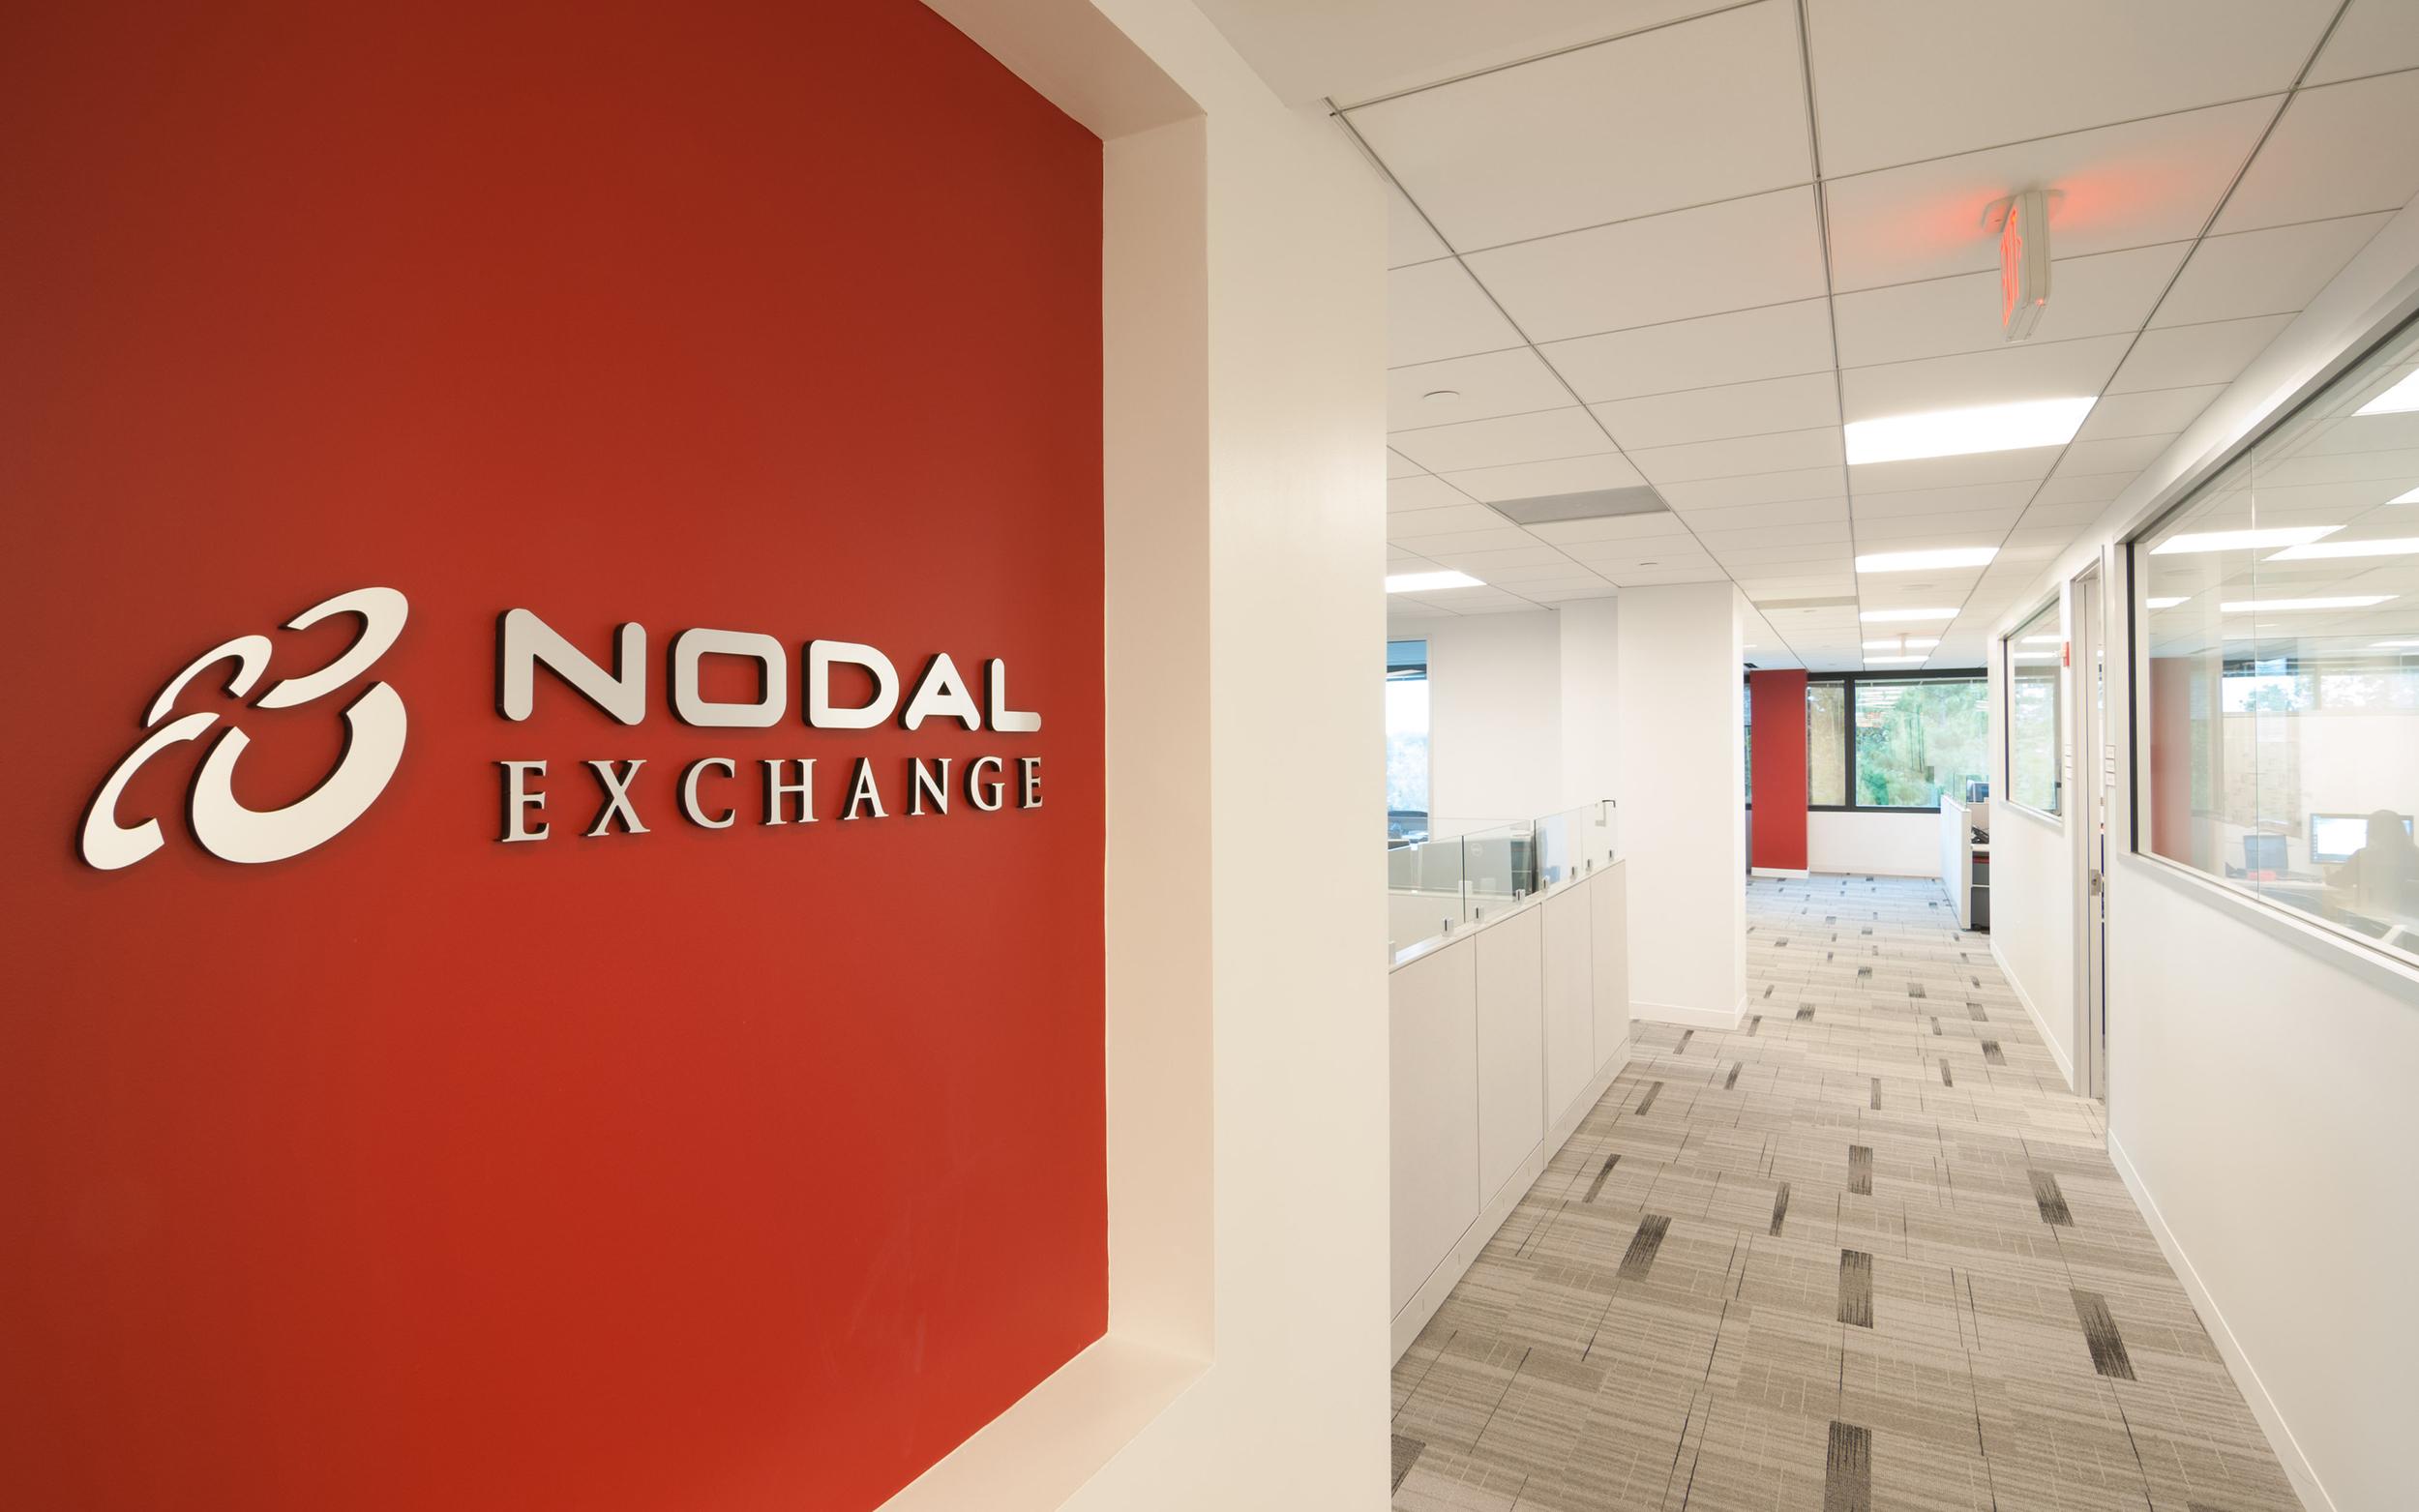 05 Nodal Exchange.jpg